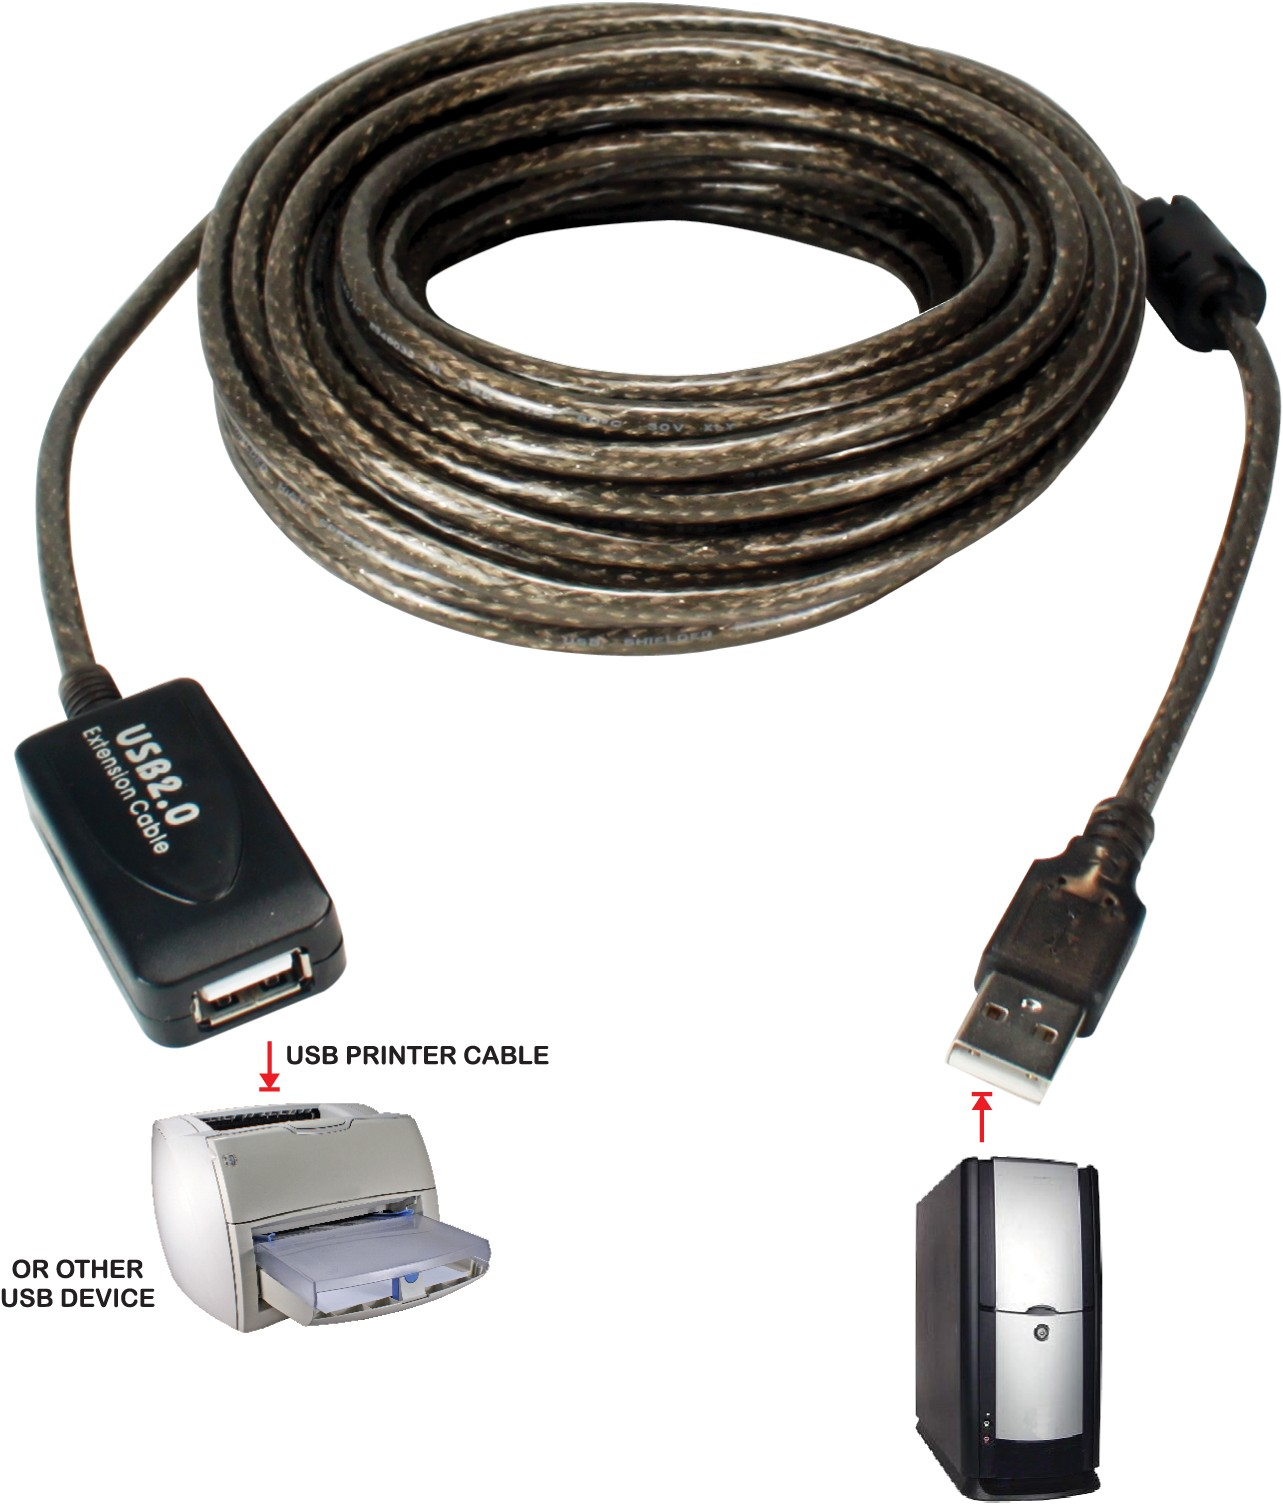 Esata/usb 2.0 to Usb 2.0 Wiring Schematic Qvs Usb 2 0 and 1 1 Pci Cards Of Esata/usb 2.0 to Usb 2.0 Wiring Schematic